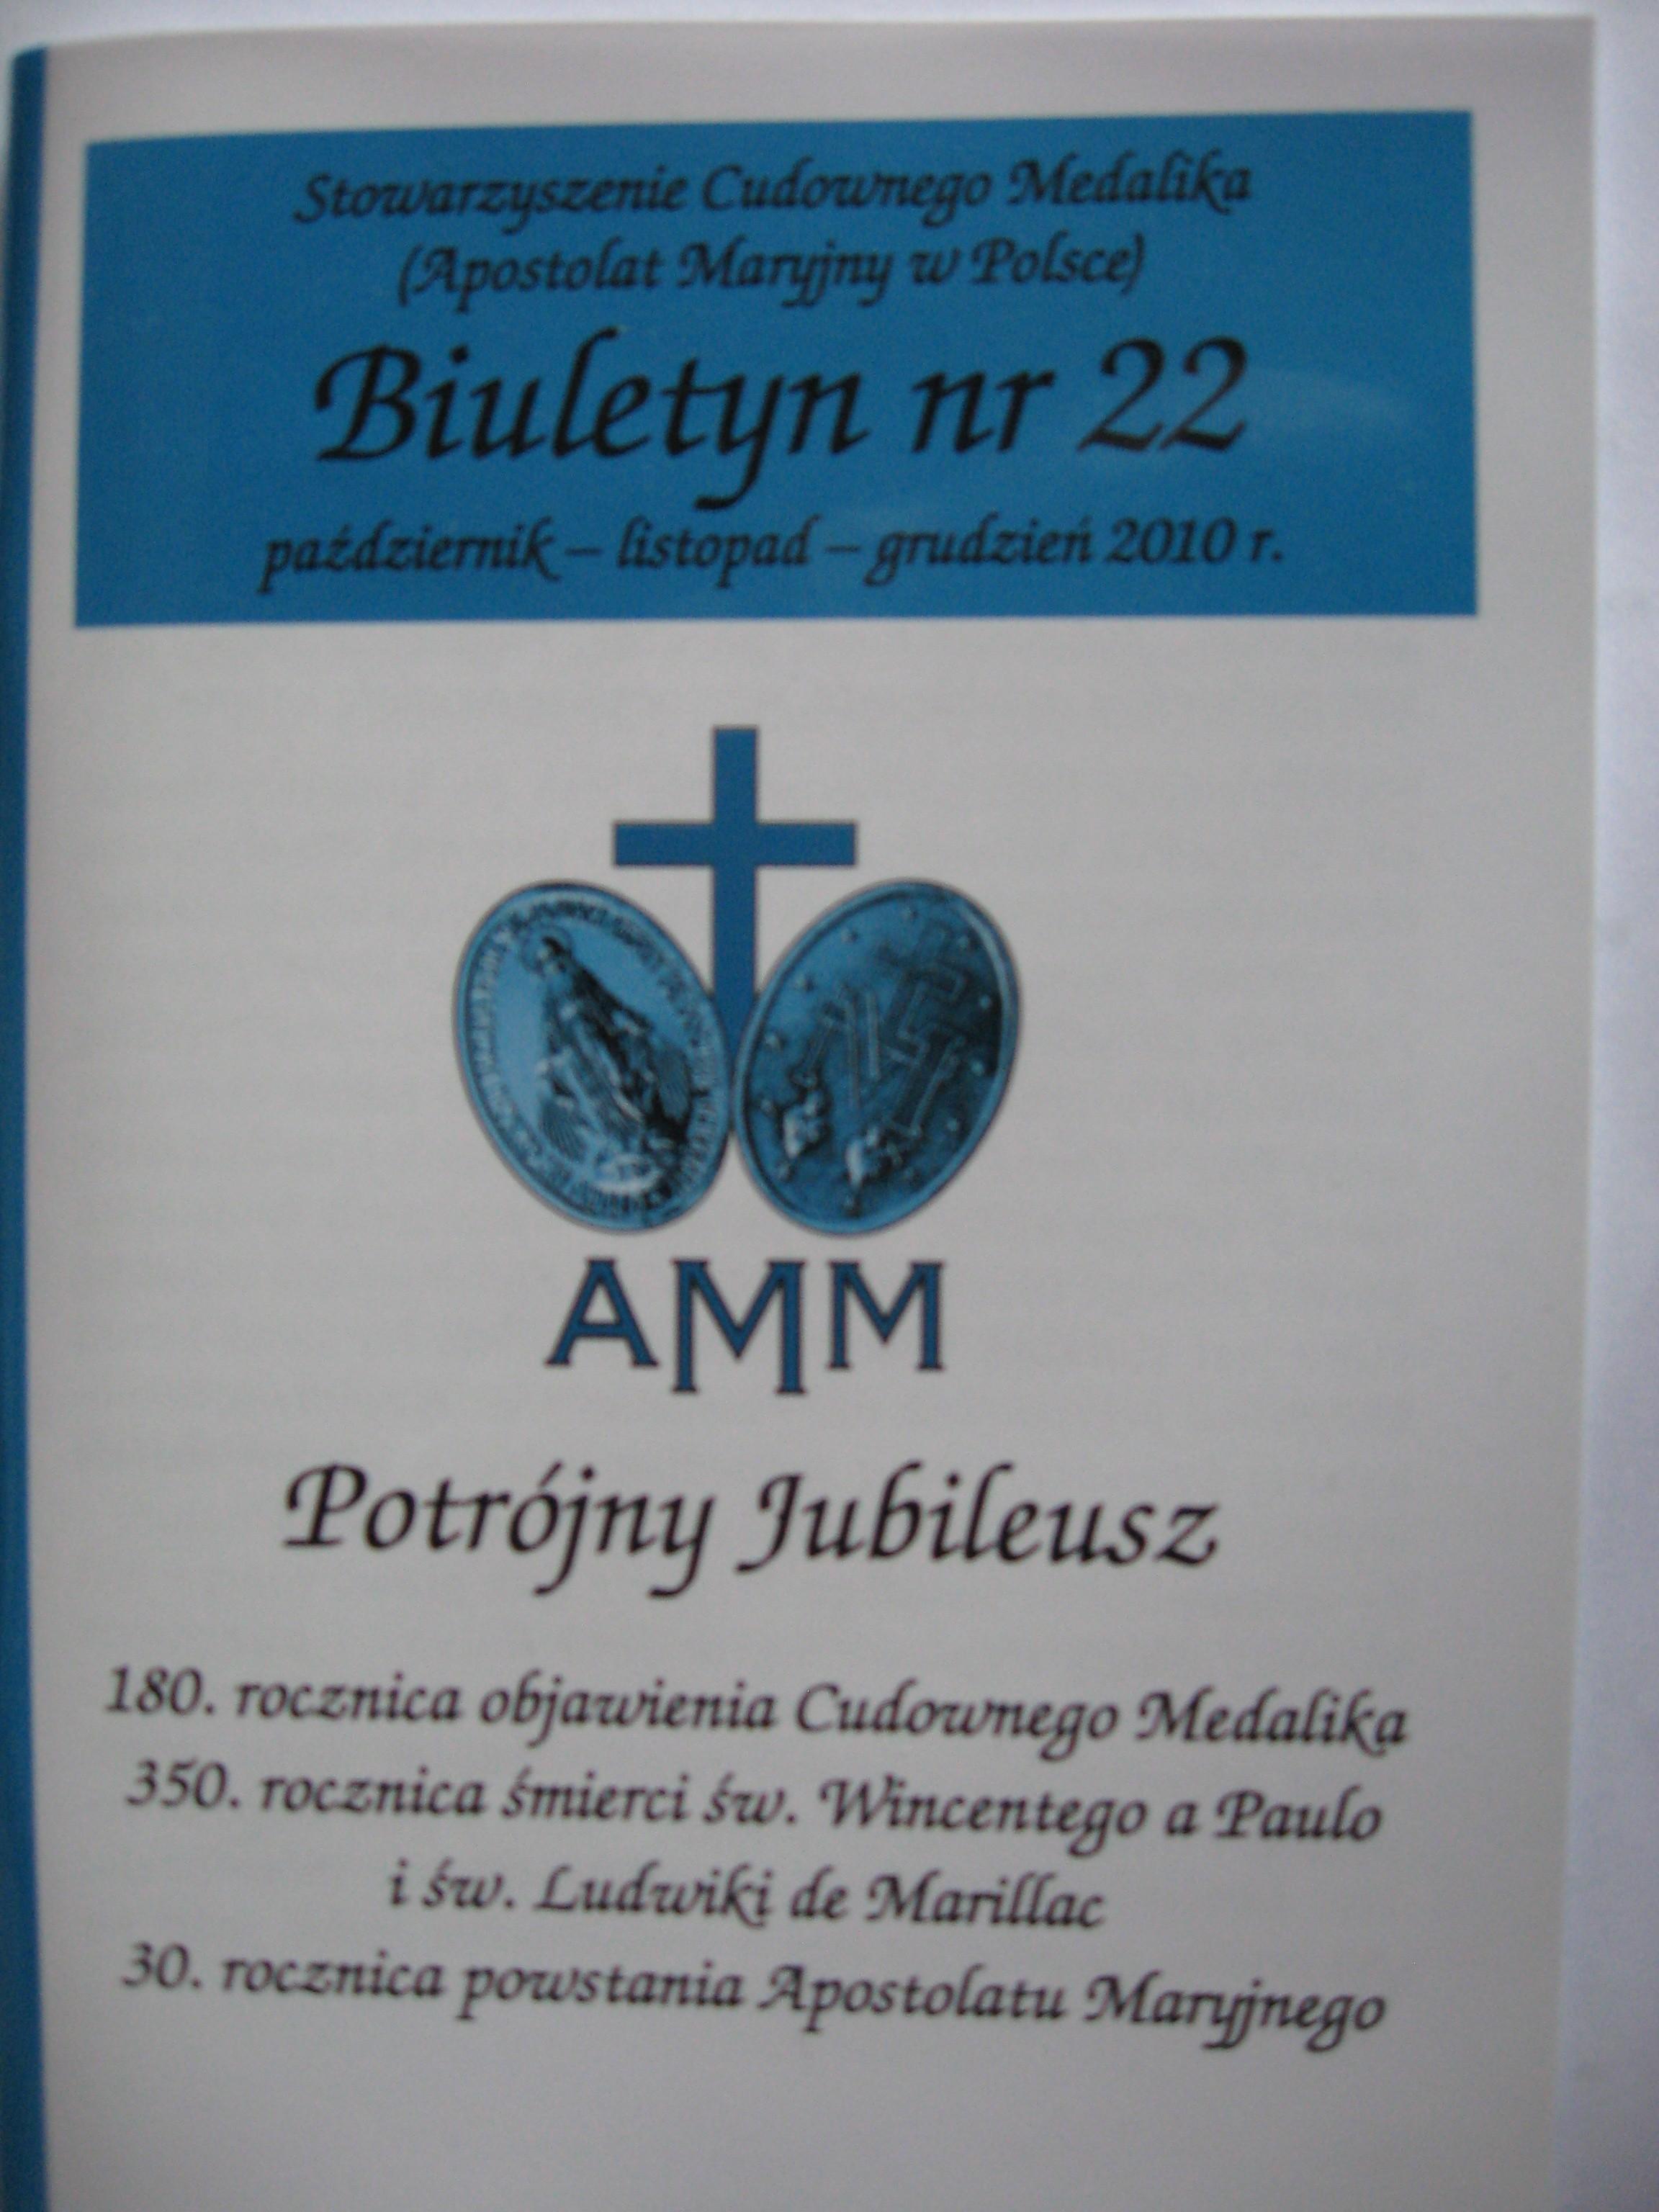 Biuletyn 22